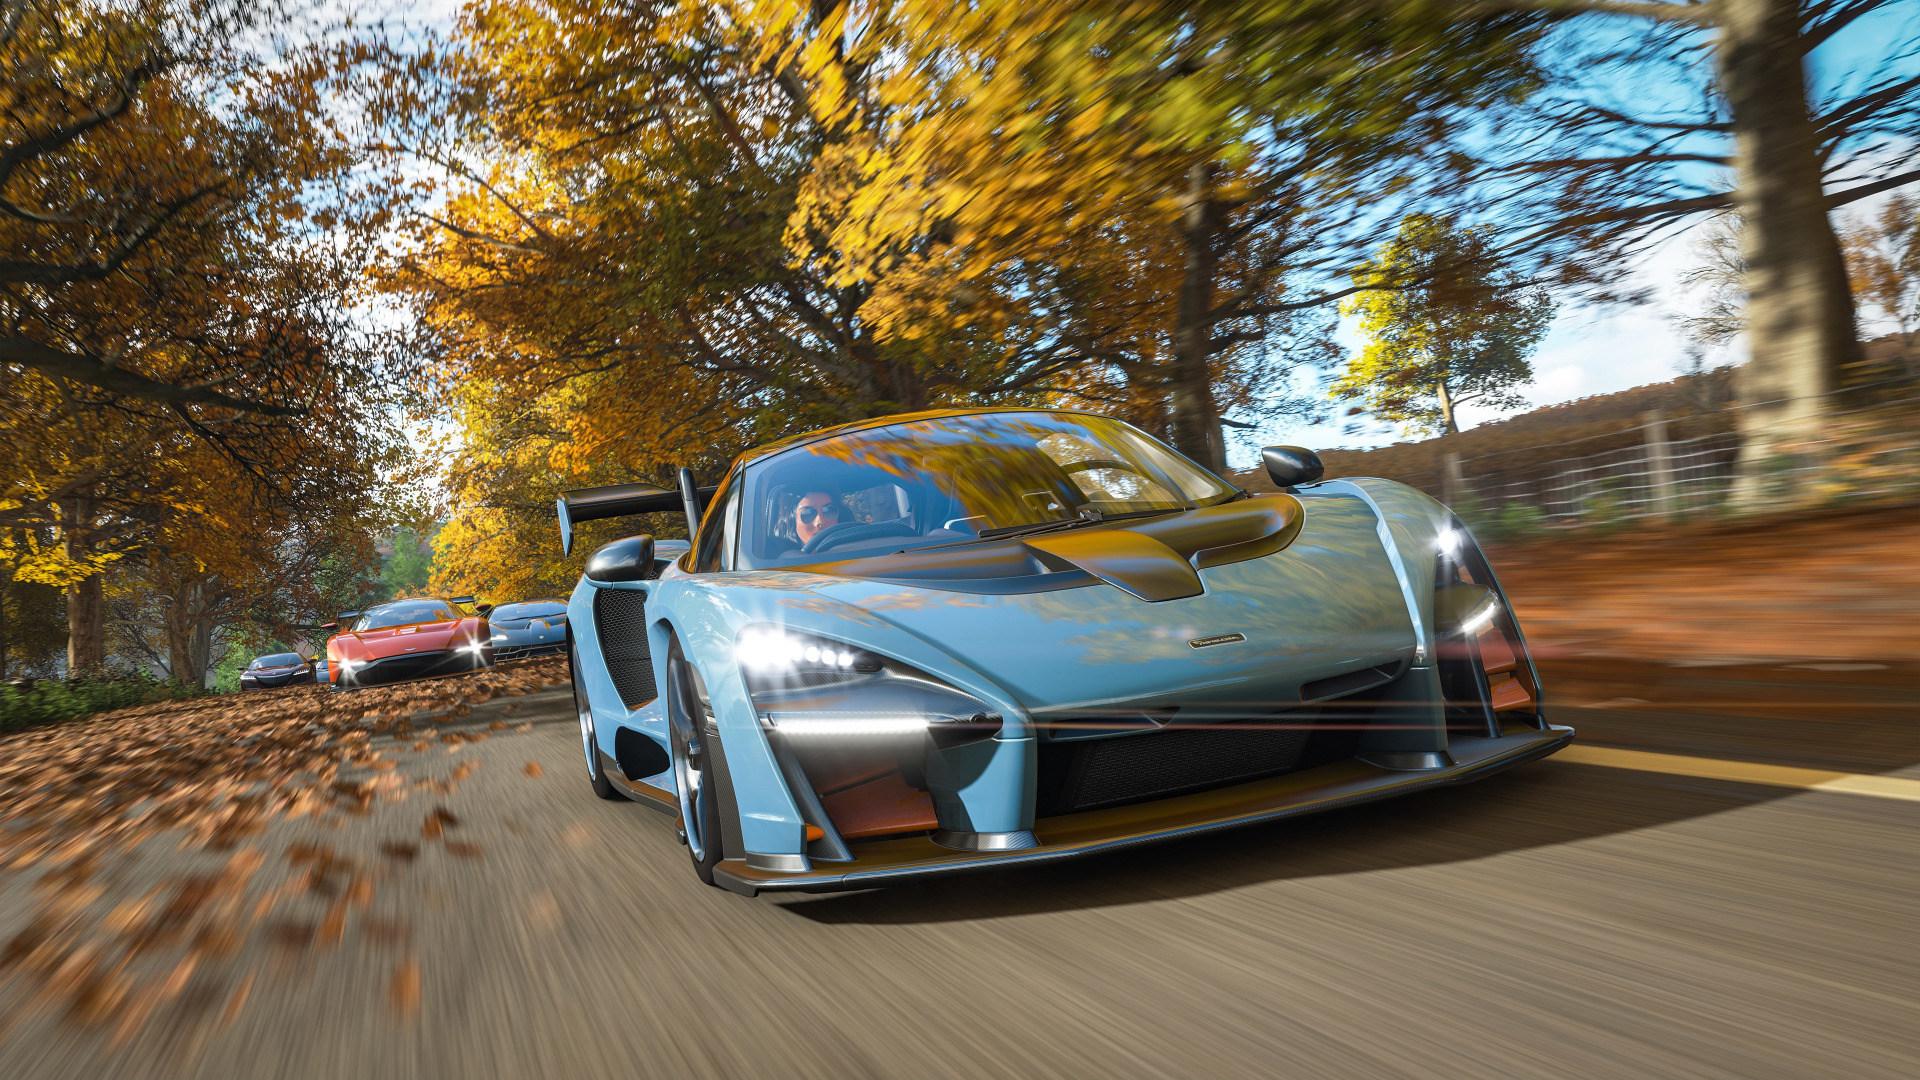 Microsoft, Spiel, Game, Forza, Autorennen, Forza Horizon 4